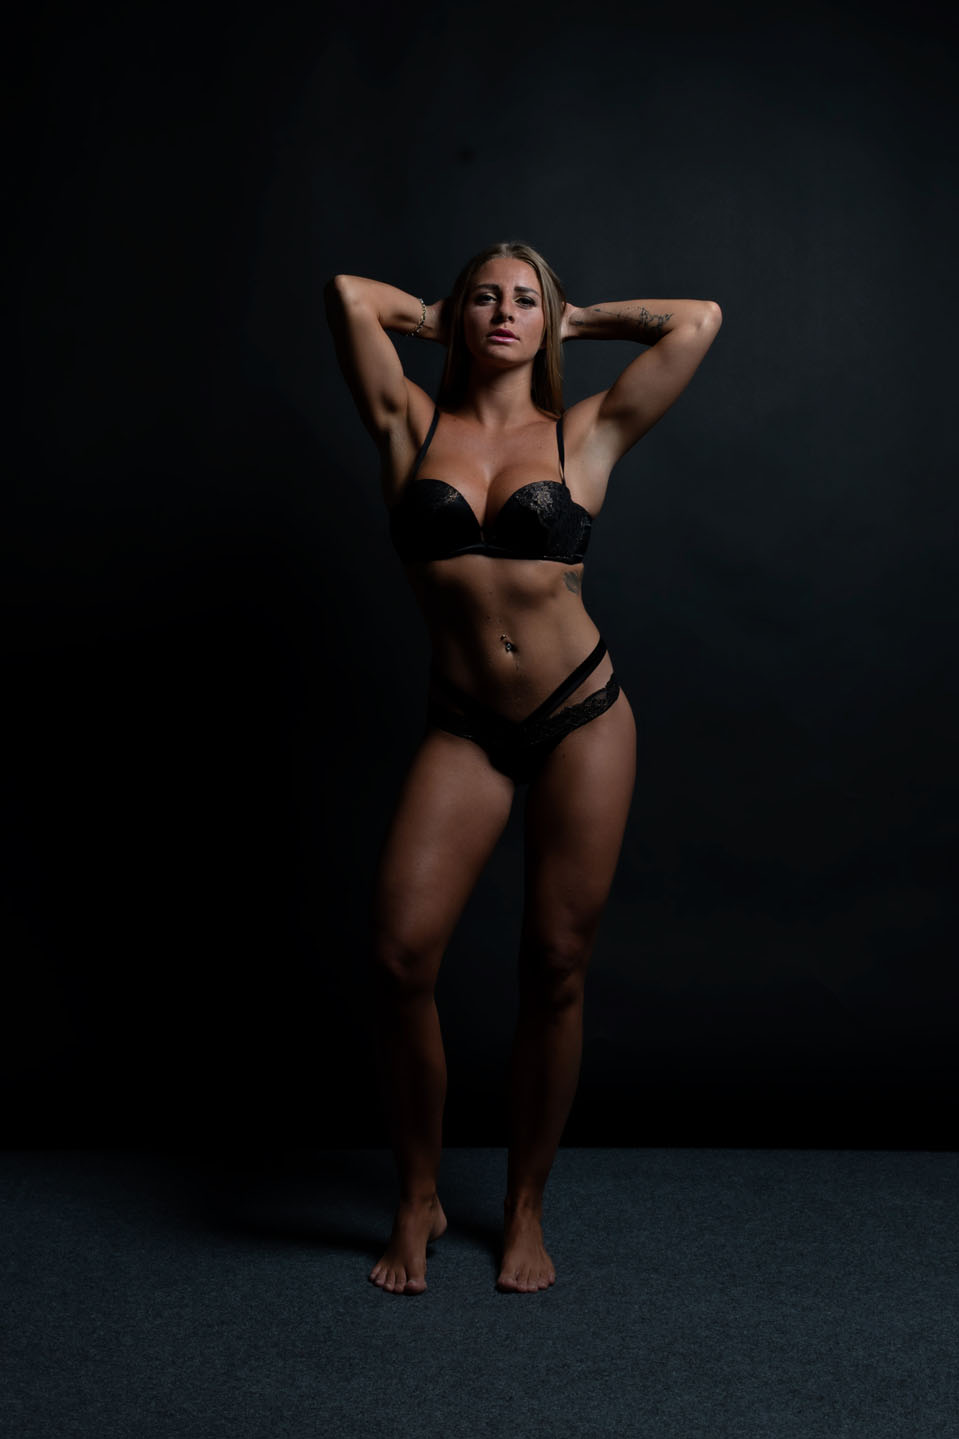 Valentina_Zamperoni_006